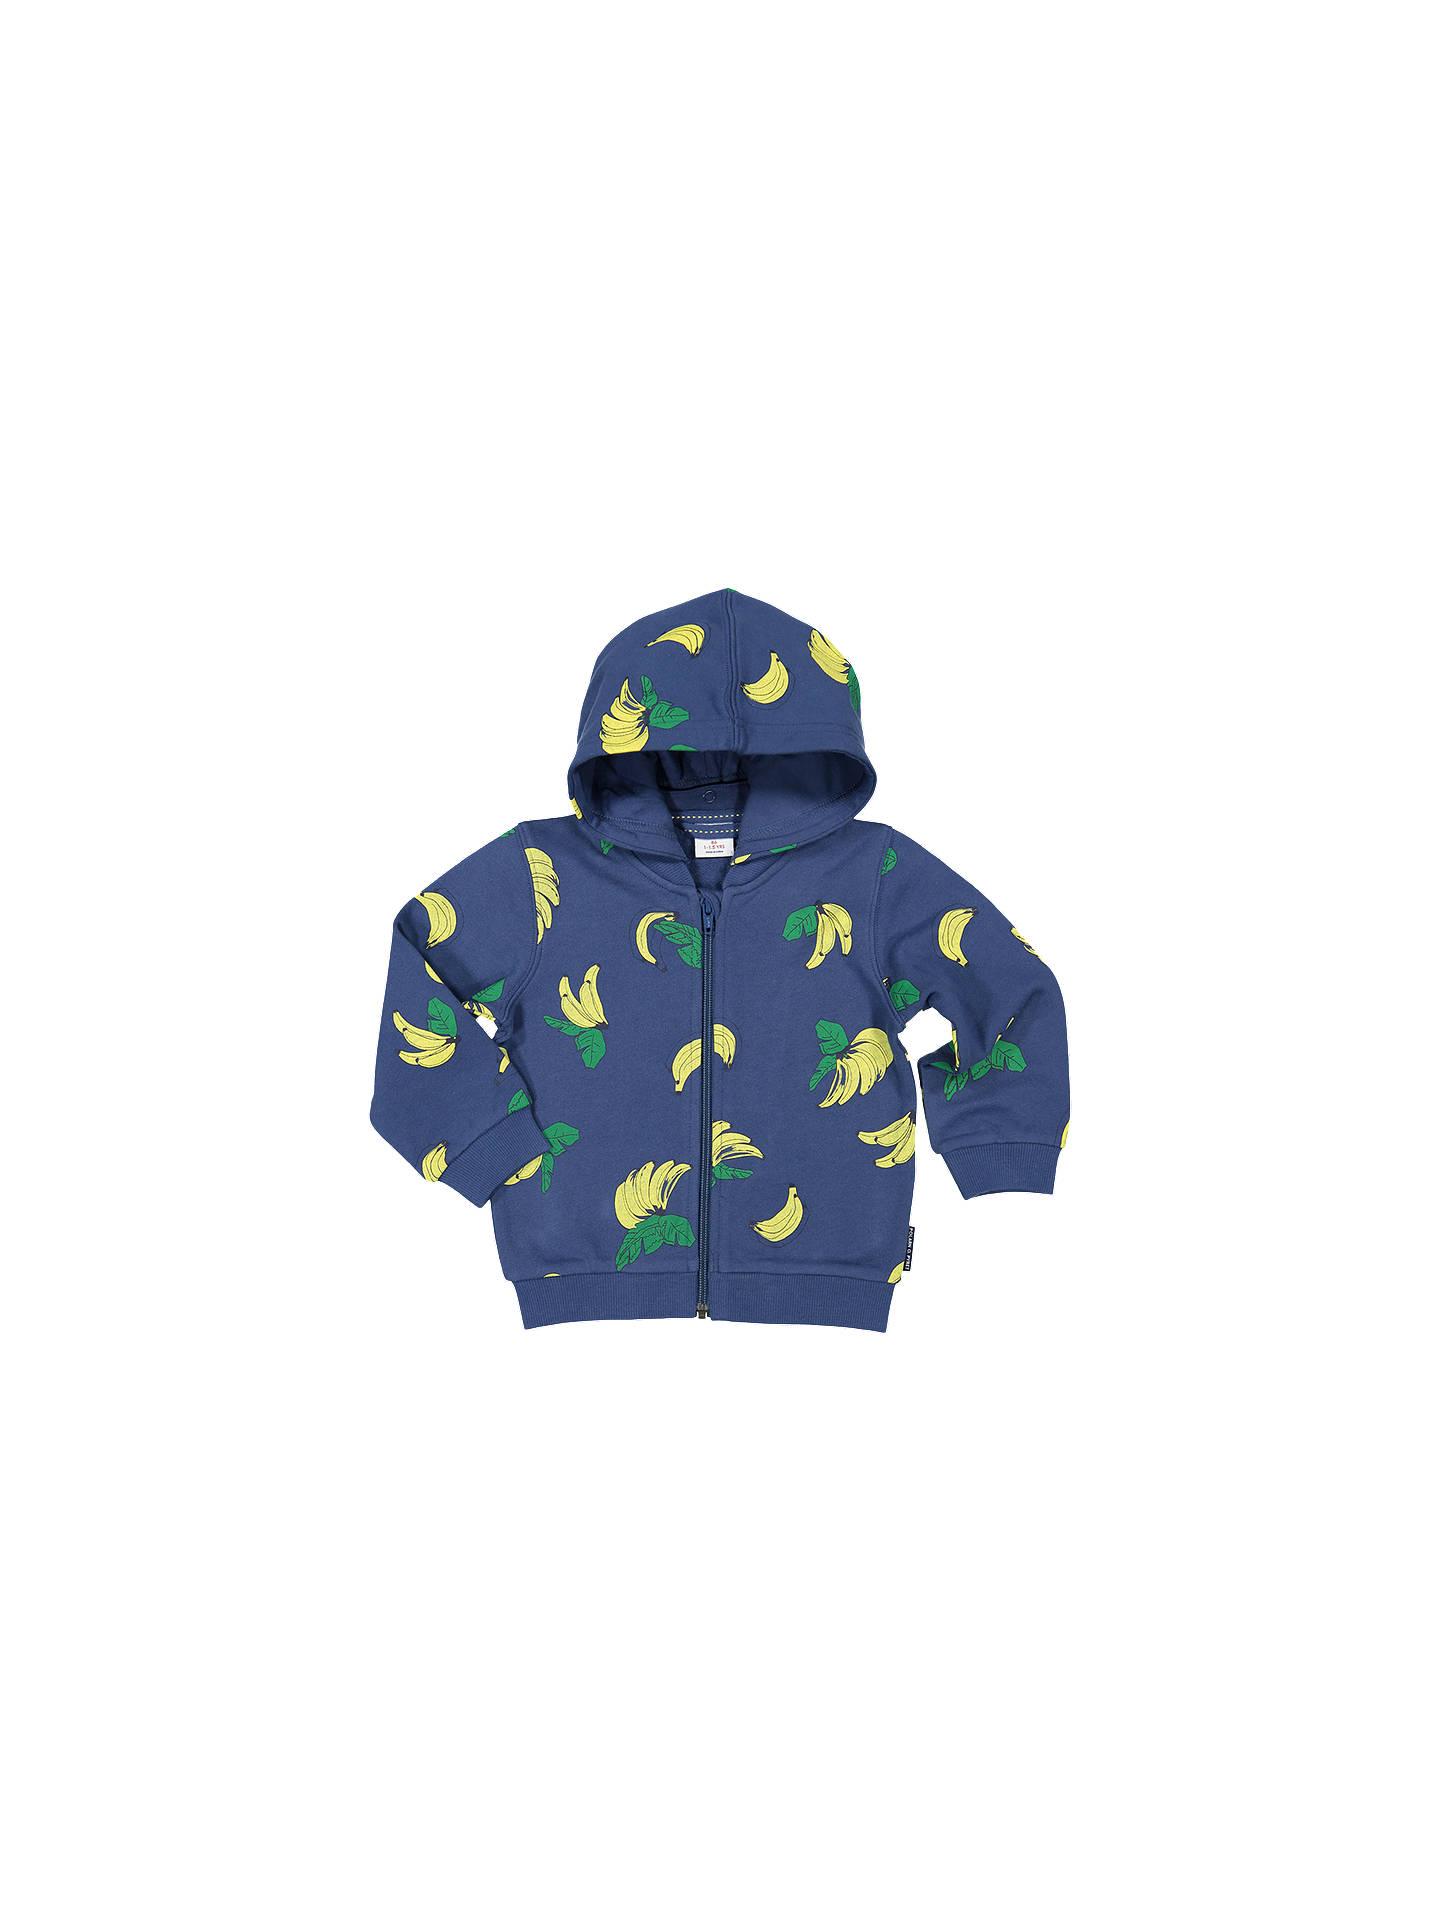 7a2670cd3 Polarn O. Pyret Baby Banana Hoodie